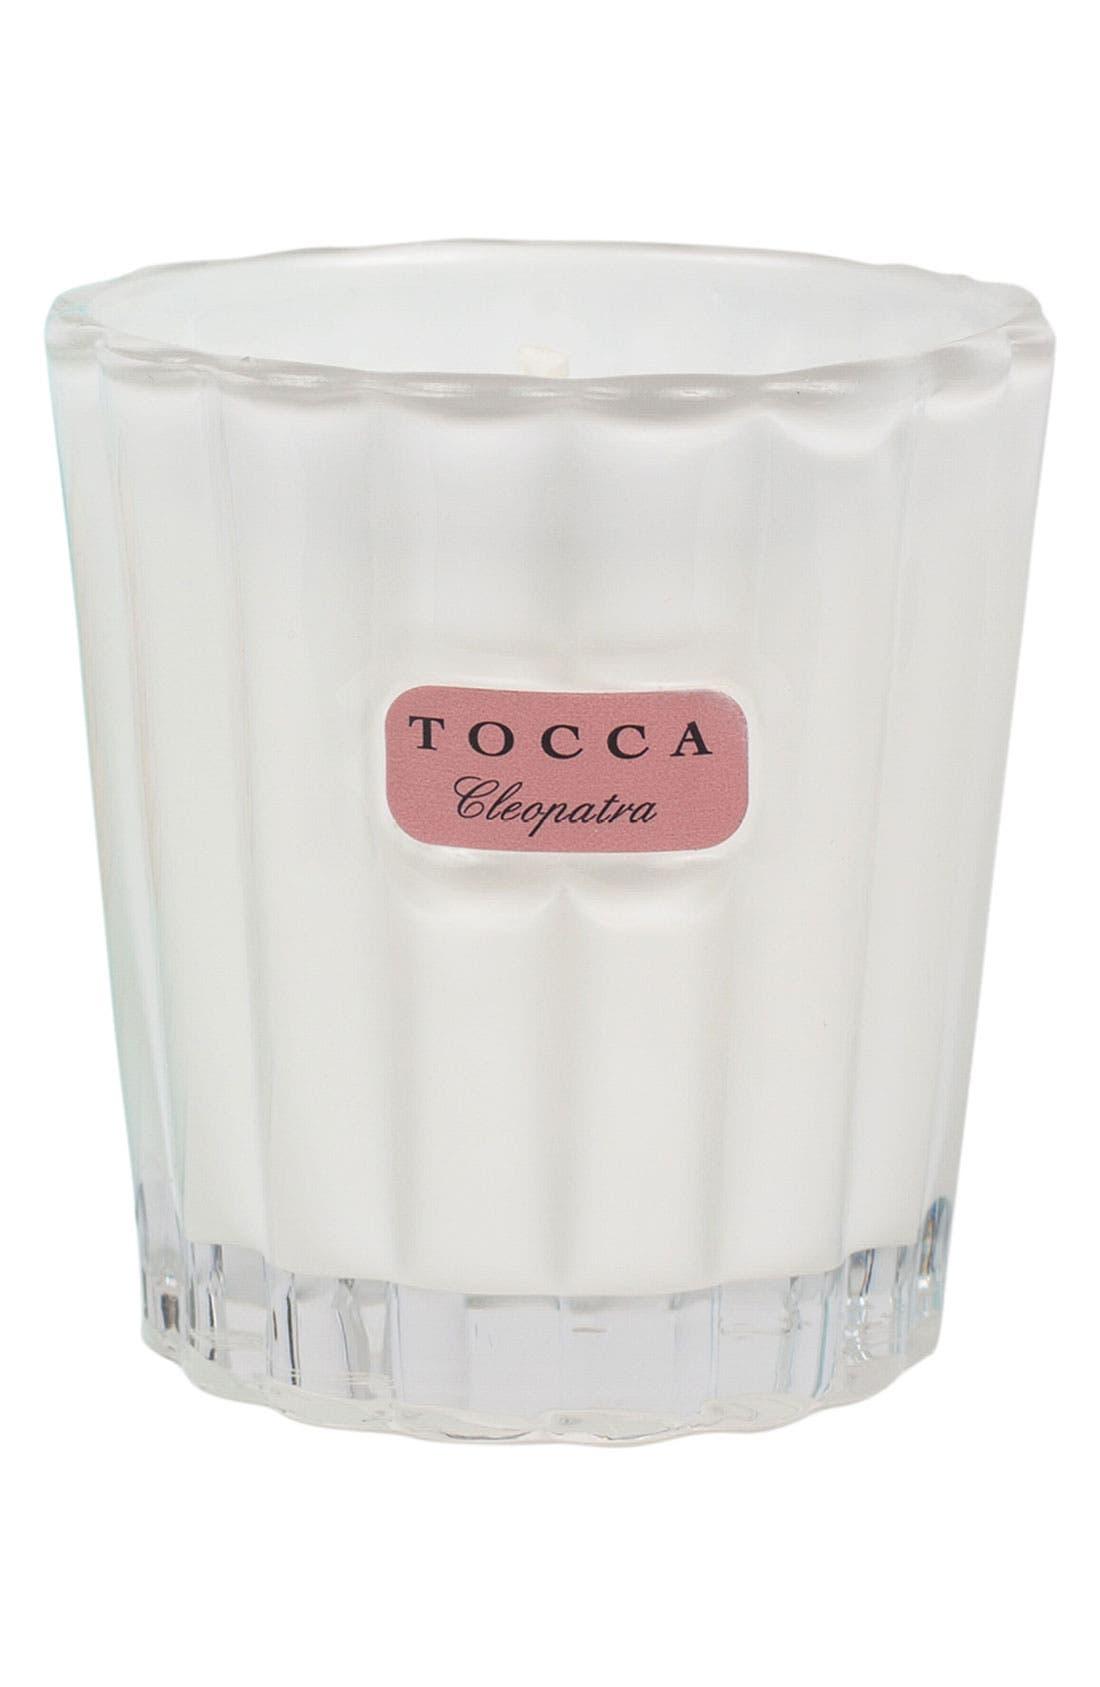 Main Image - TOCCA 'Cleopatra' Candelina